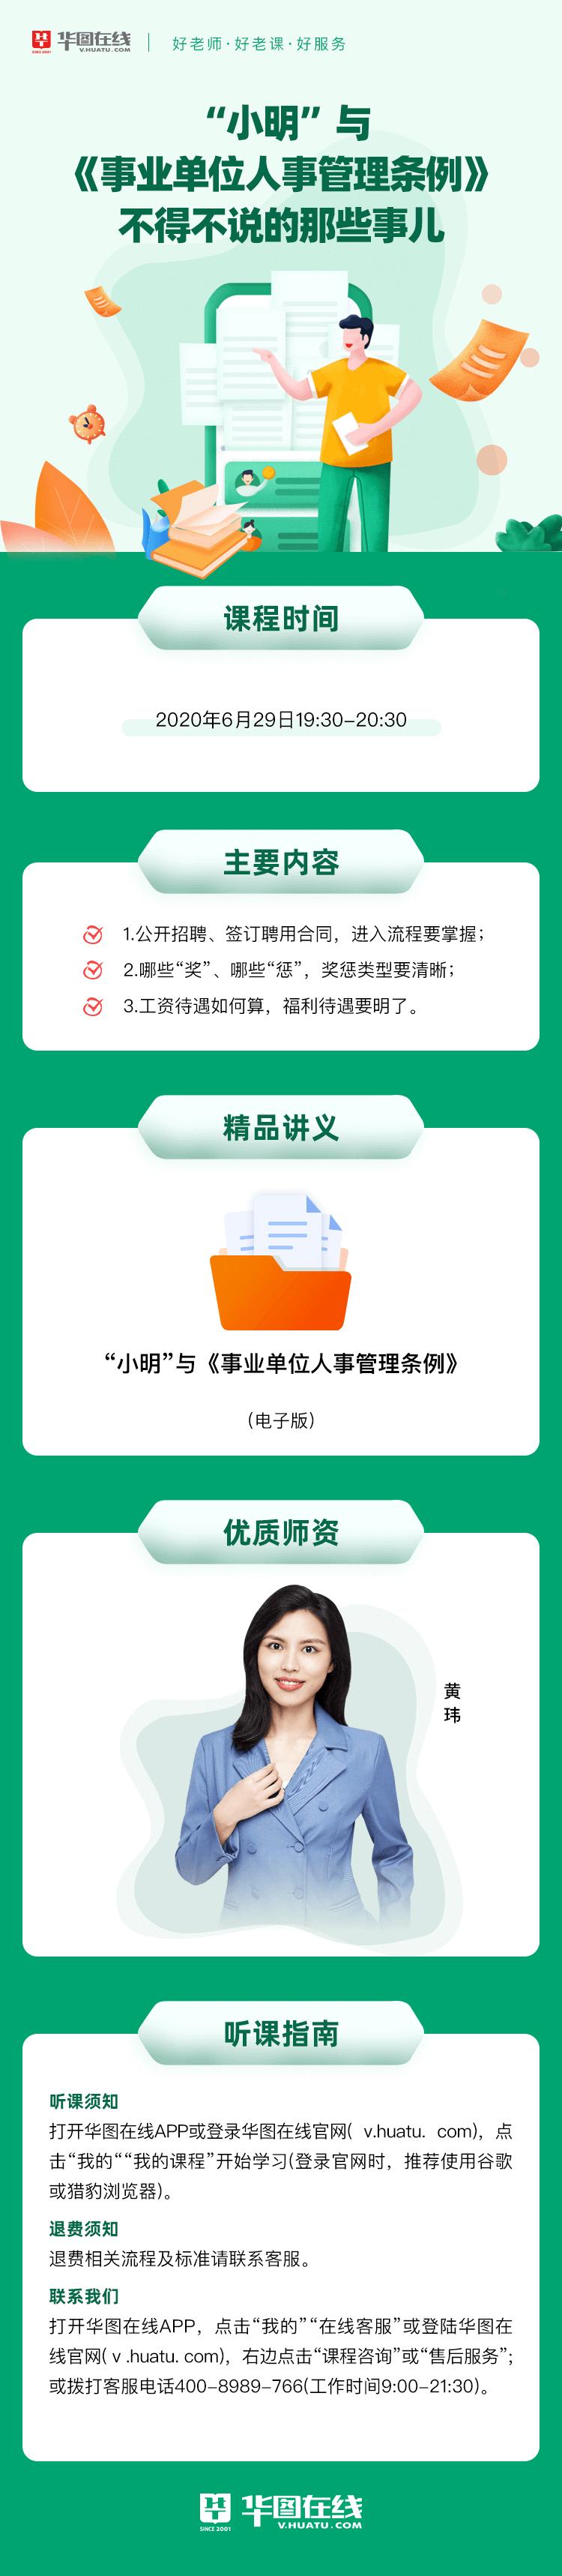 http://upload.htexam.com/userimg/1592311462.png